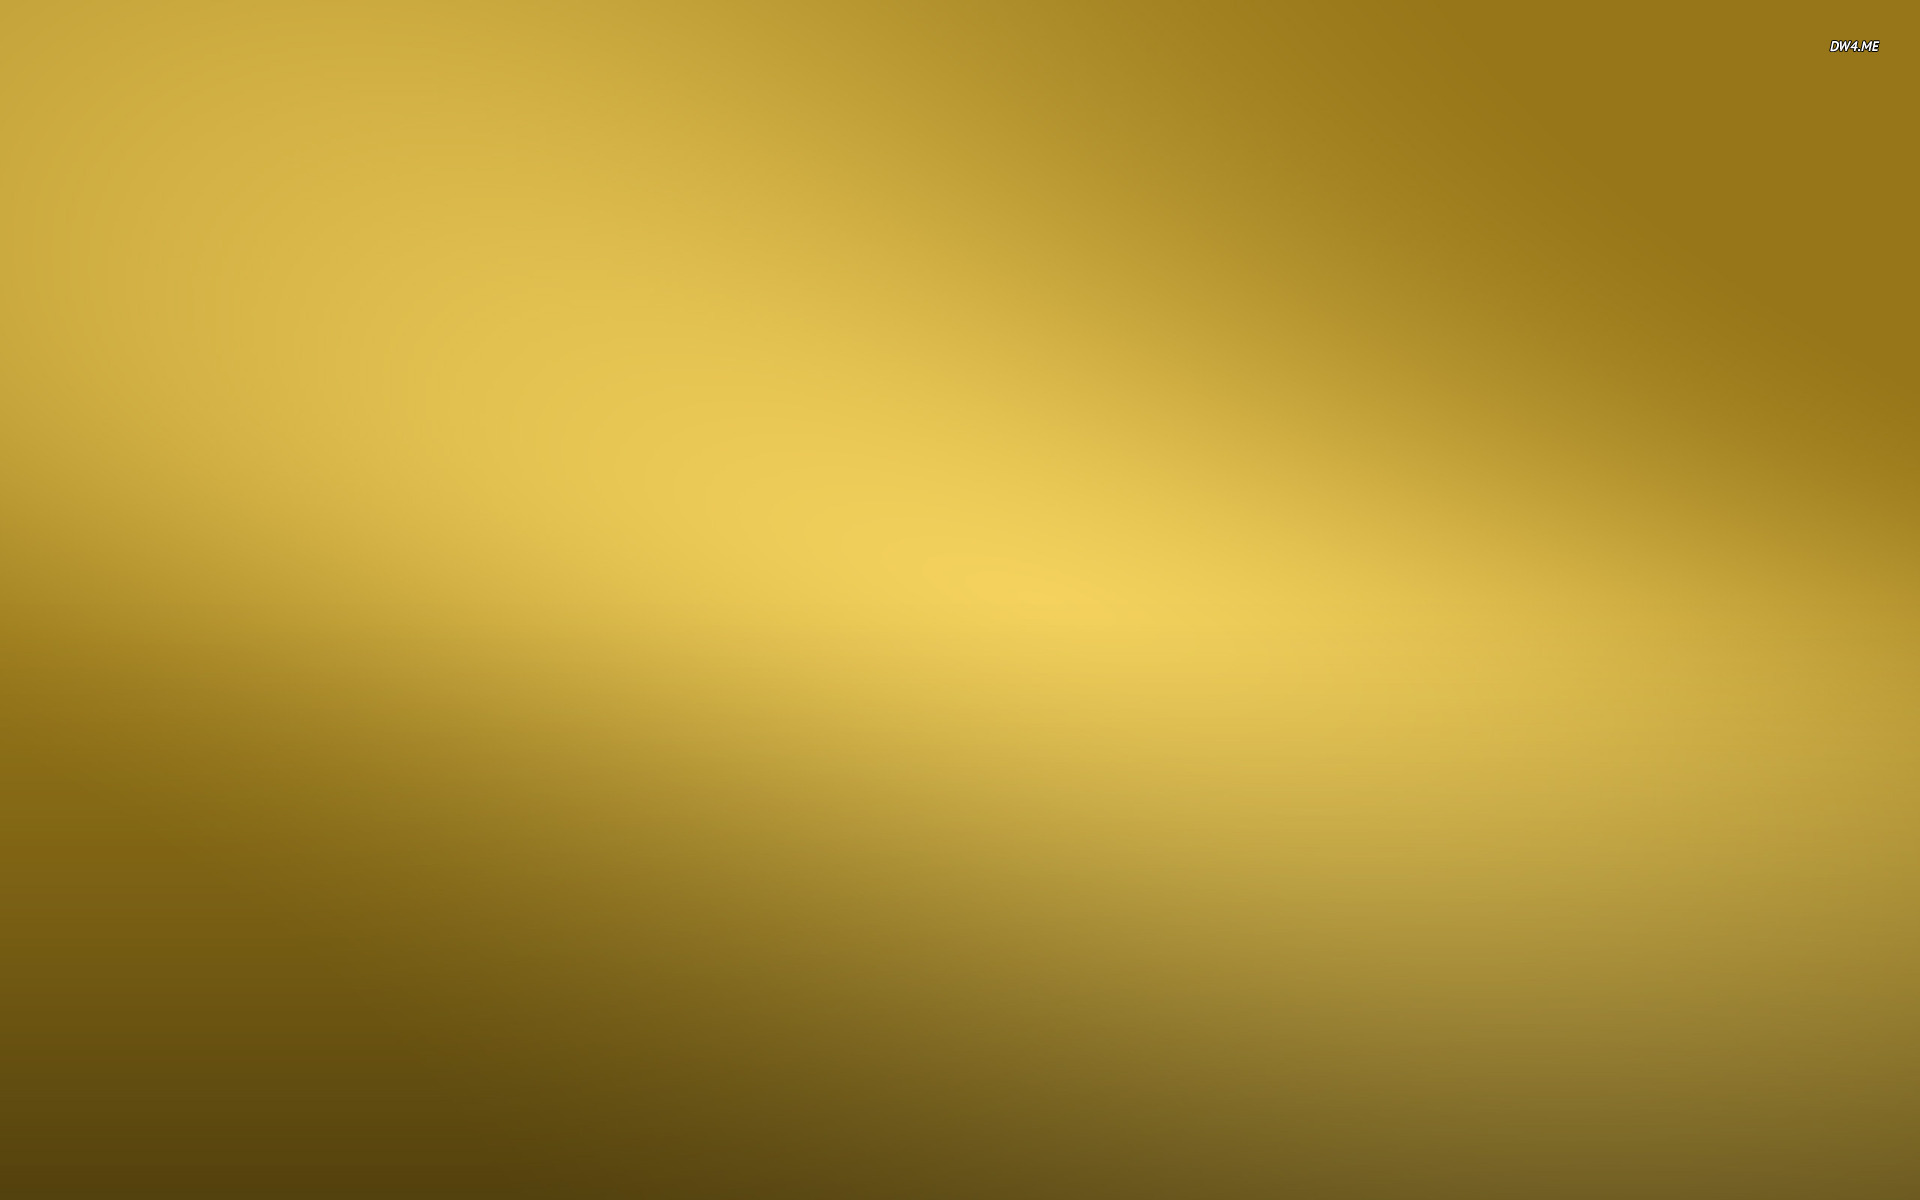 Gold wallpaper   Minimalistic wallpapers   389 1920x1200